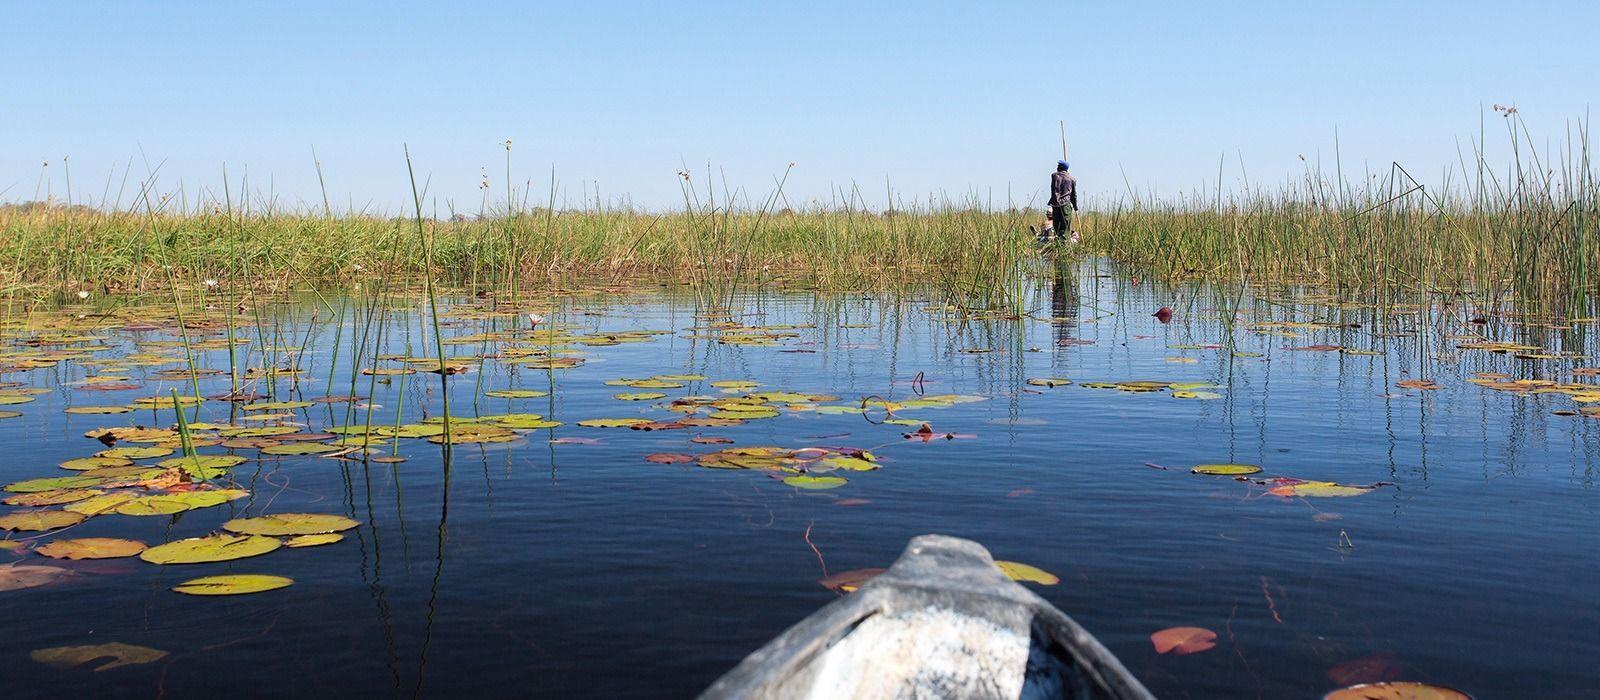 Destination Maun Botswana